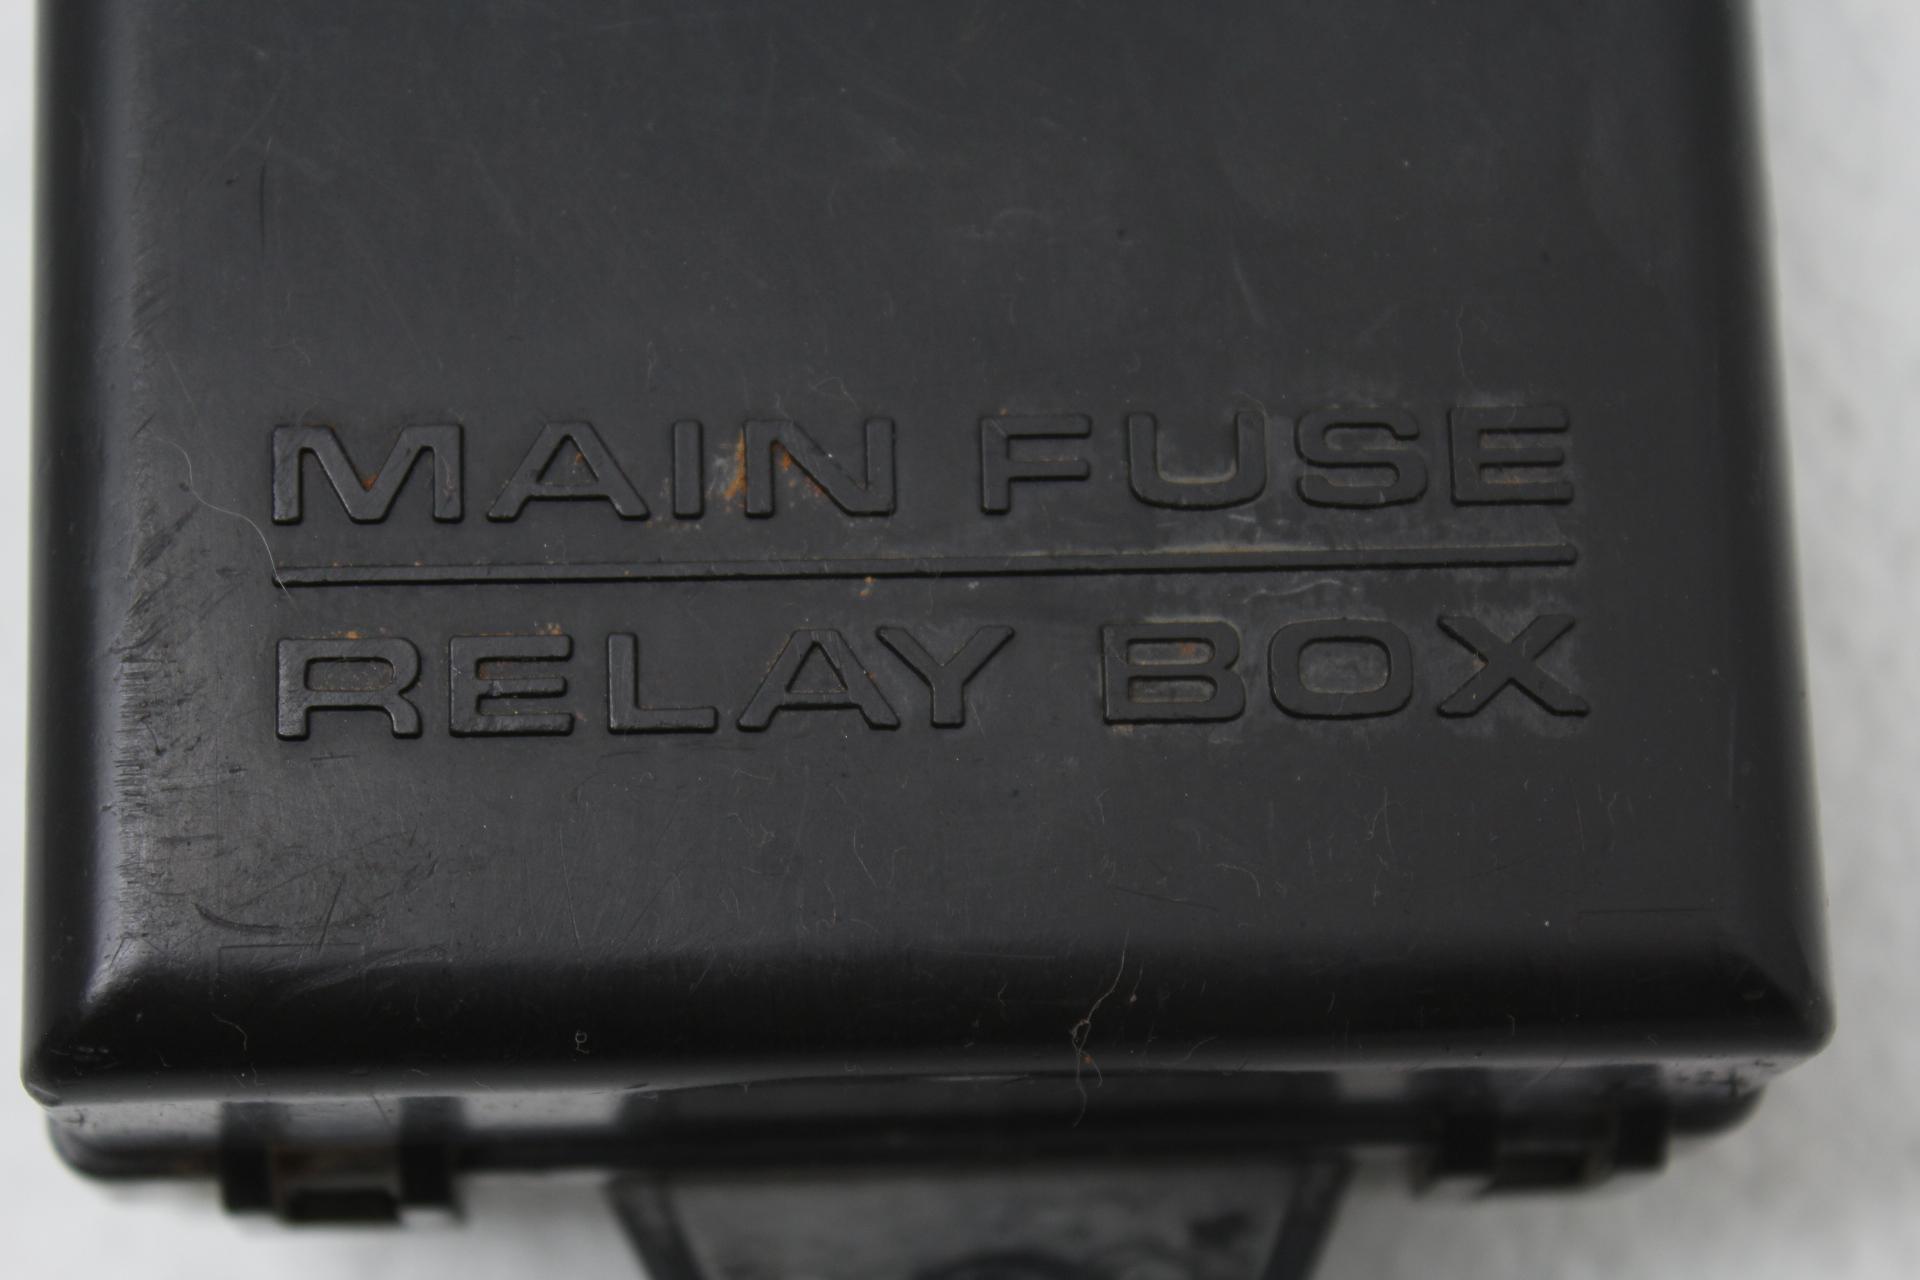 2002 2005 subaru impreza wrx   sti engine bay fuse box